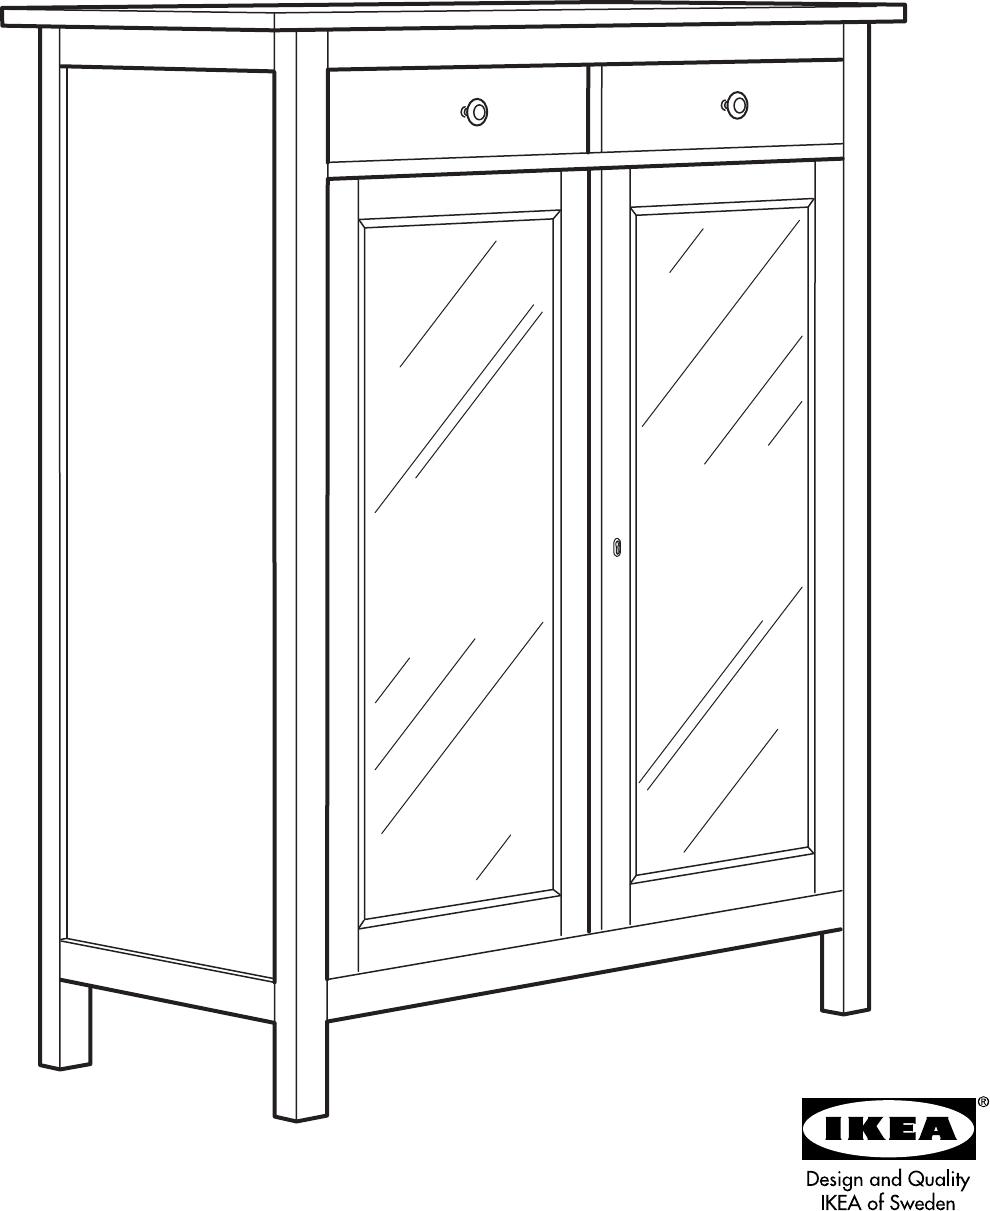 Ikea Hemnes Linen Cabinet Assembly Instruction